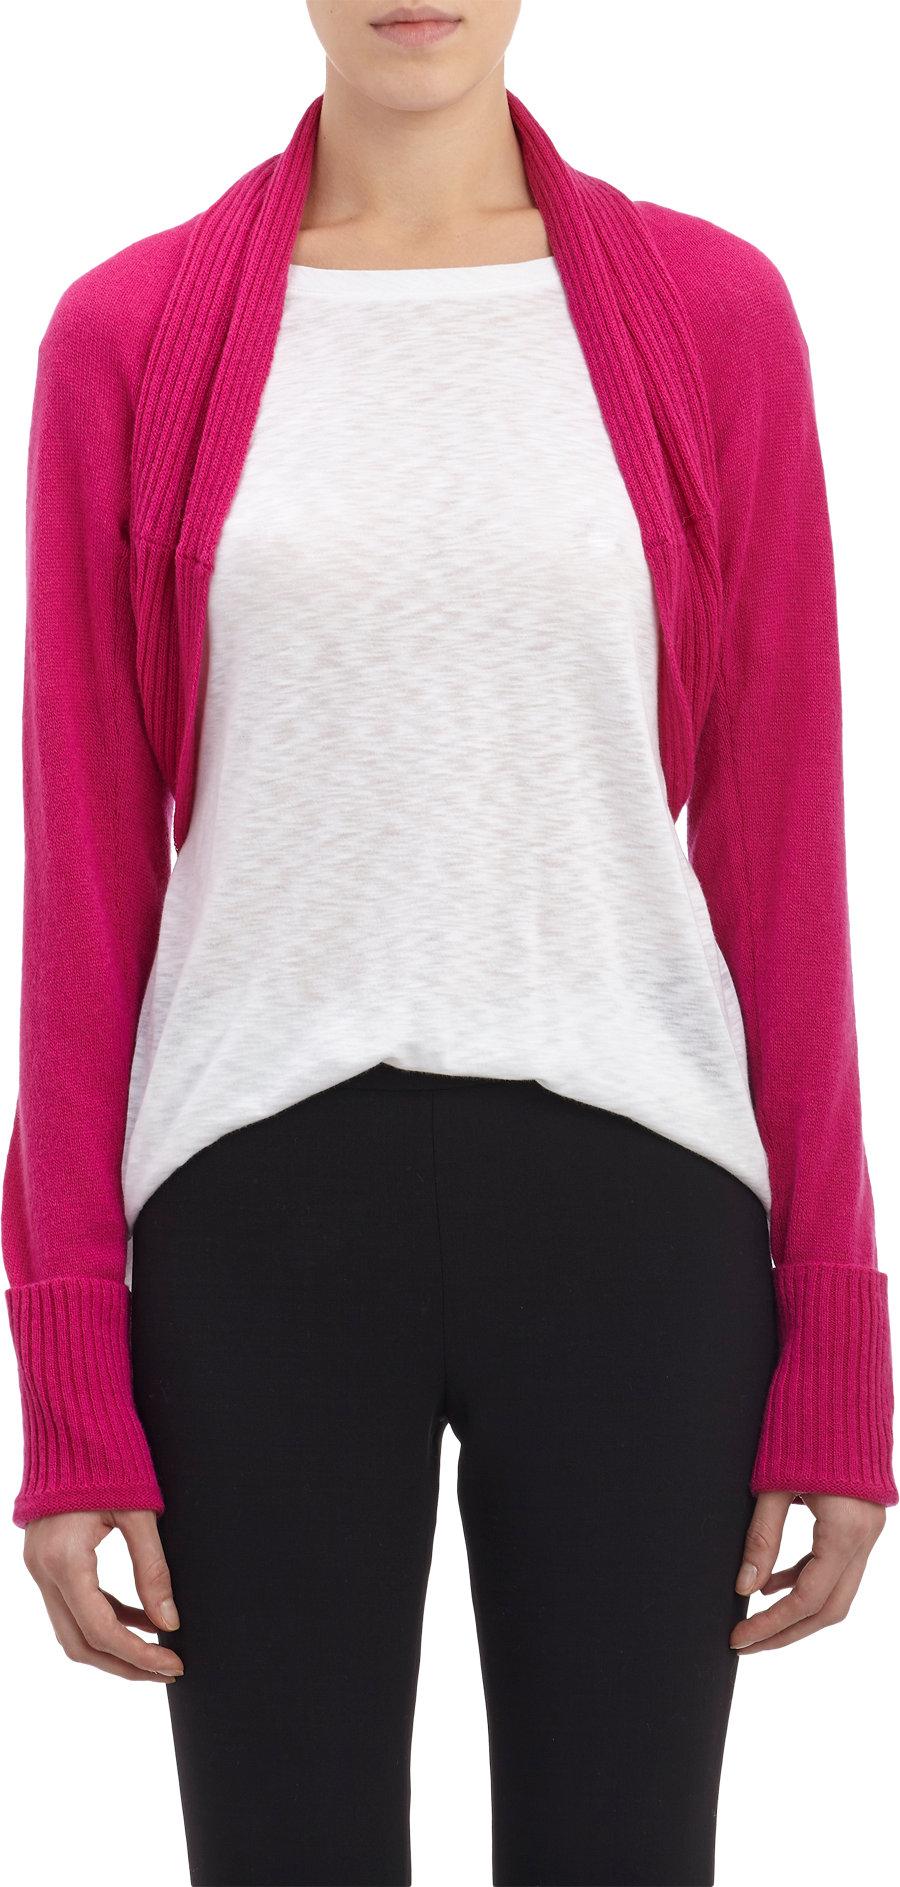 Long Sleeved Shrug Knitting Pattern : Barneys new york Chunky Rib-Knit Long-Sleeve Shrug in Pink Lyst